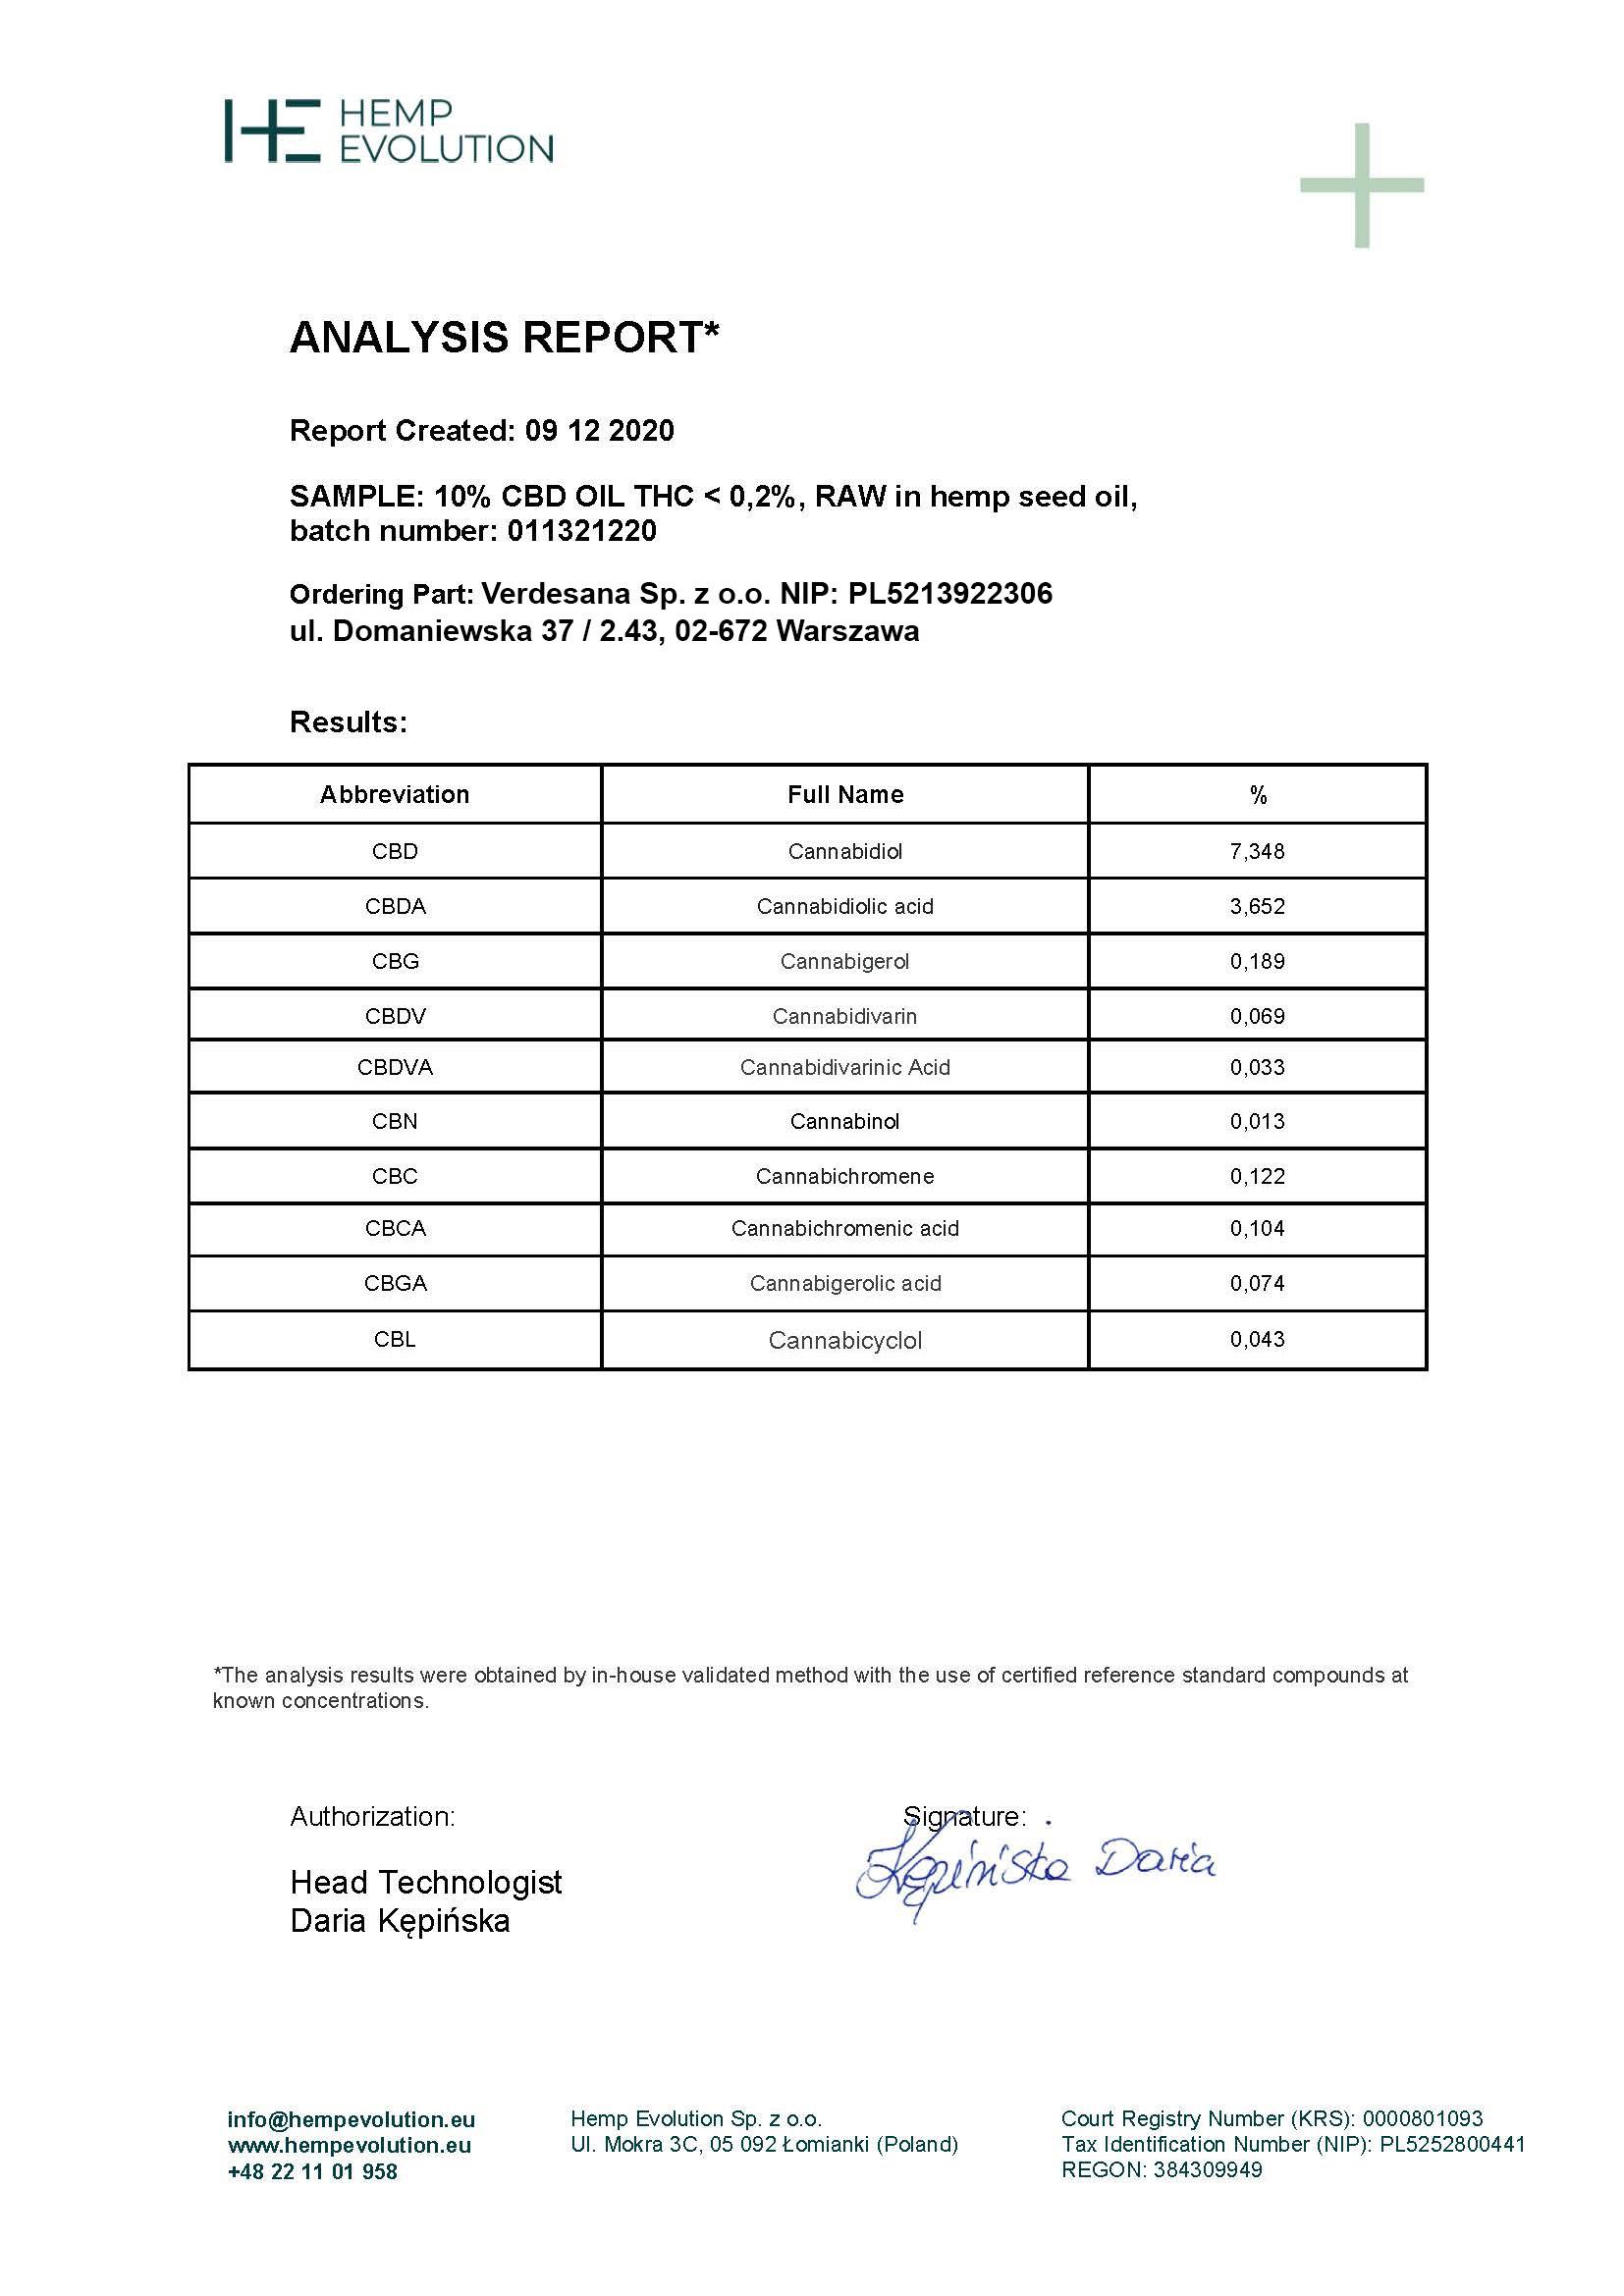 Certyfikat analizy - Verdesana Ekstrakt Konopny 10% CBD THC pon 02% RAW